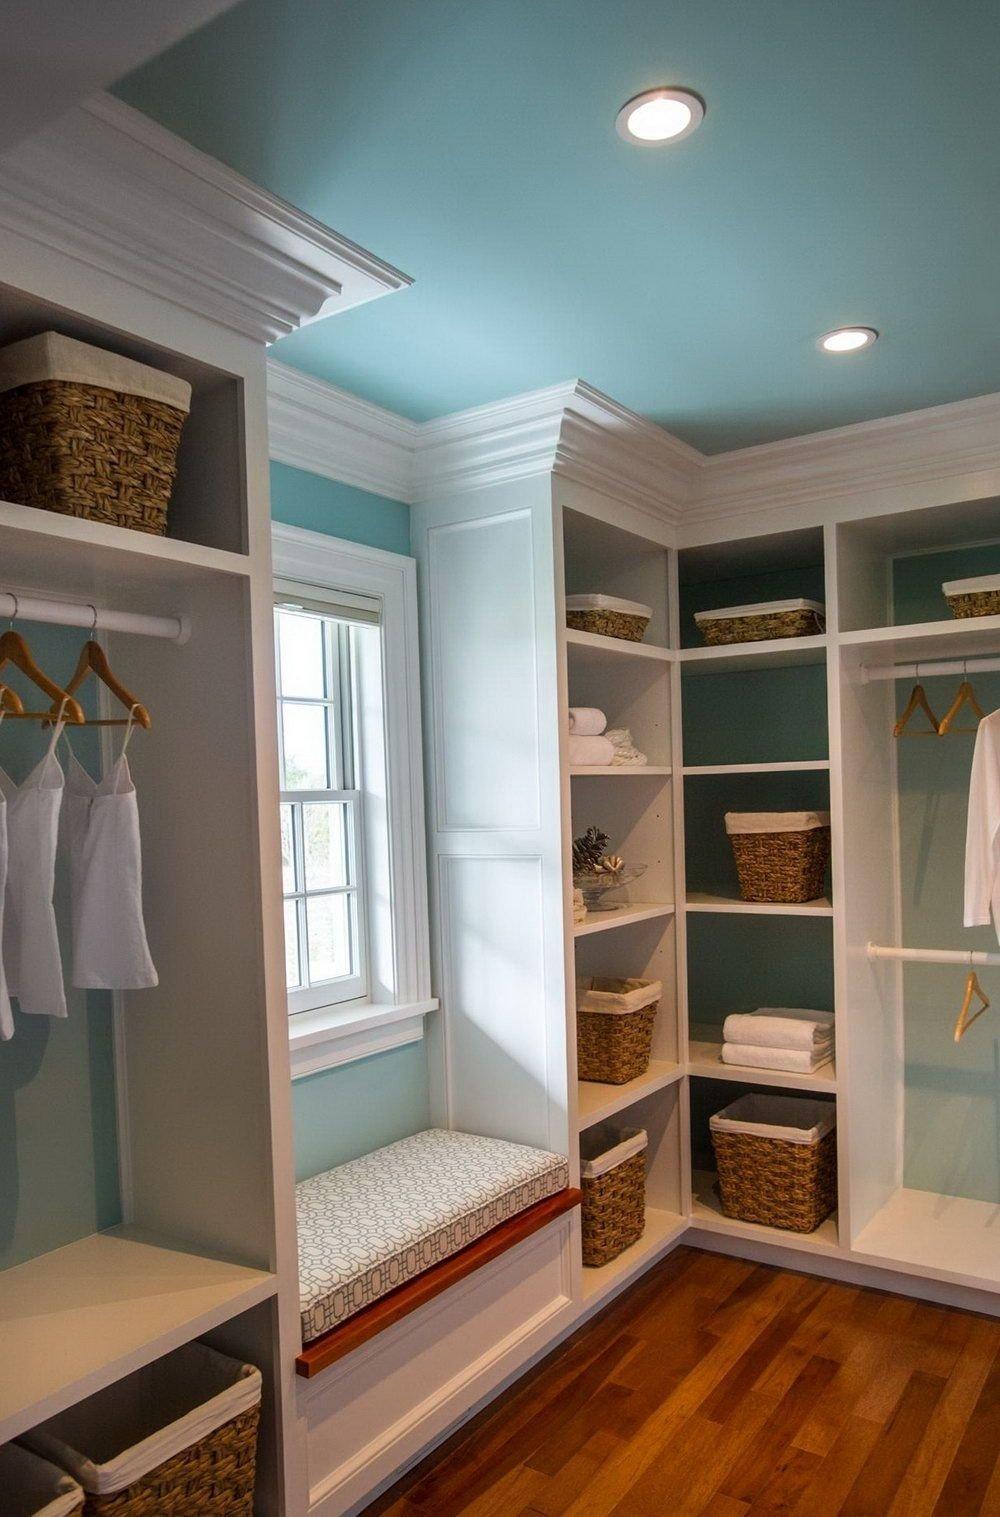 10 Stylish Small Walk In Closet Ideas 12 small walk in closet ideas and organizer designs vanities 2021